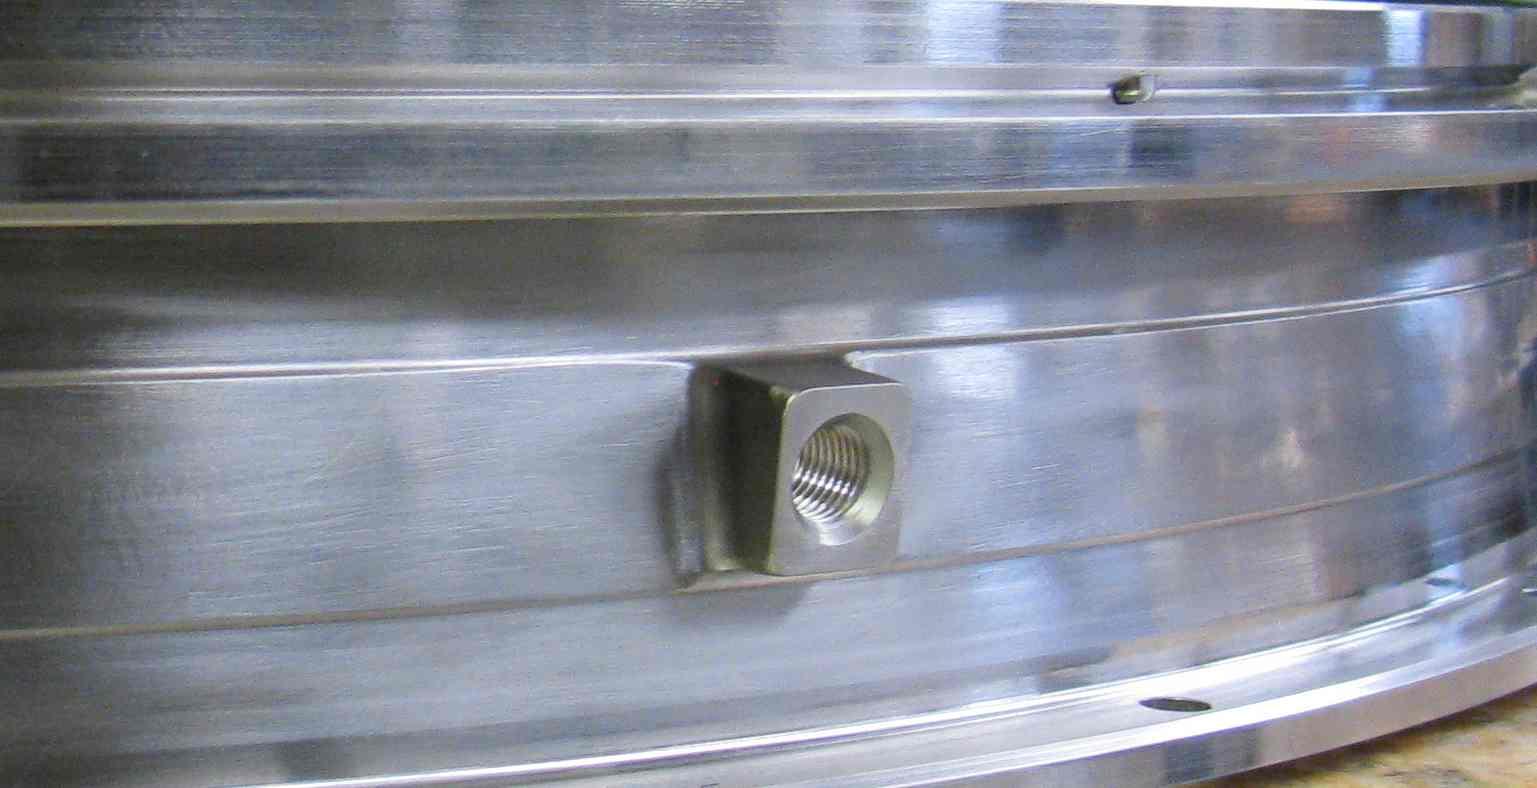 https://aerospaceconsultants.com/wp-content/uploads/2014/11/Stacking-Ring-Lug.jpg